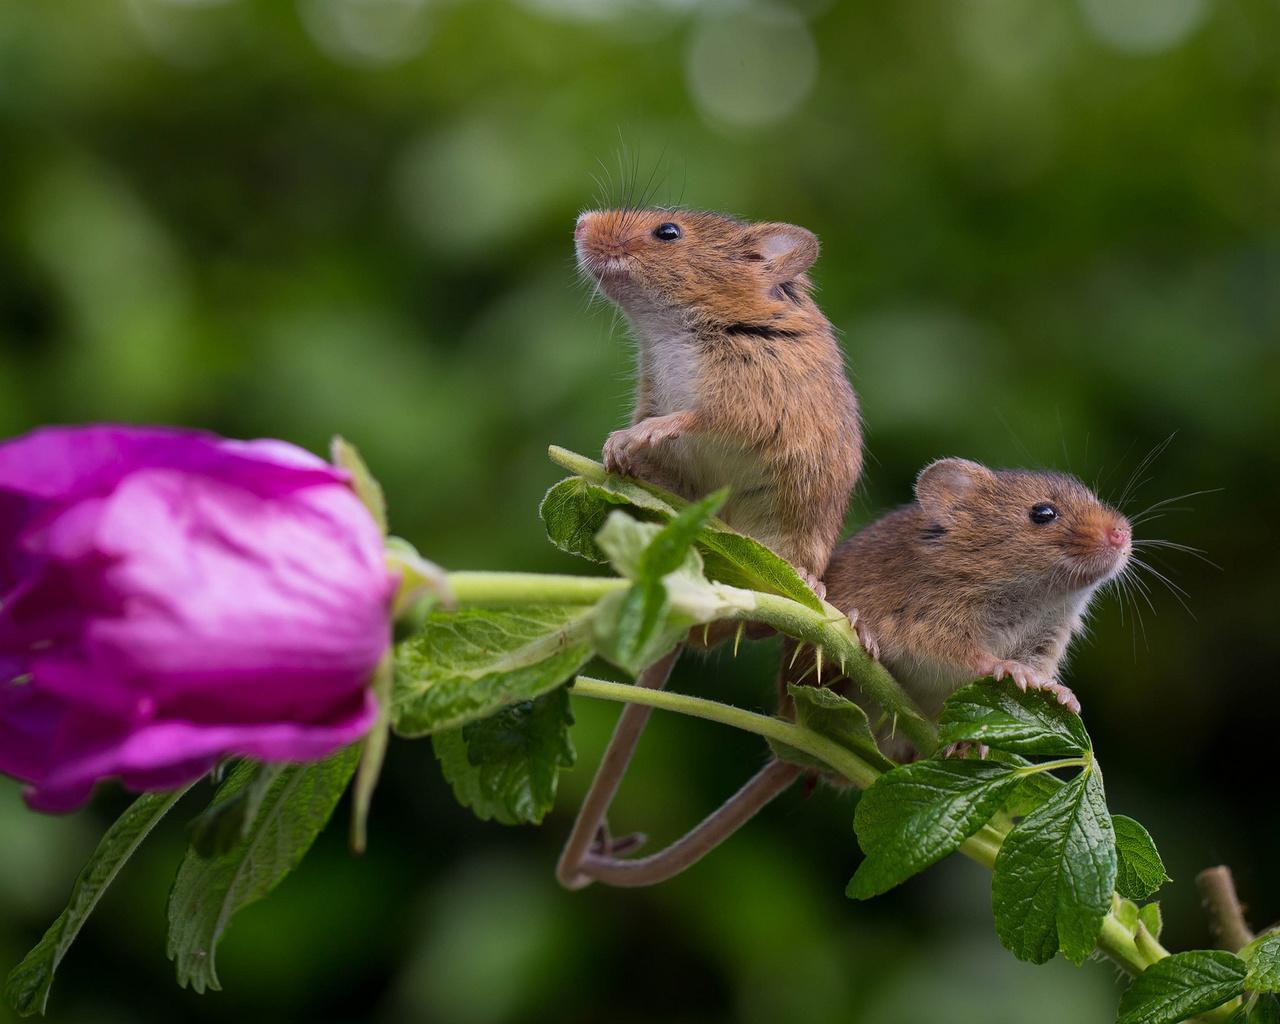 животные, зверьки, грызуны, мыши, пара, мышки, цветок, роза, боке